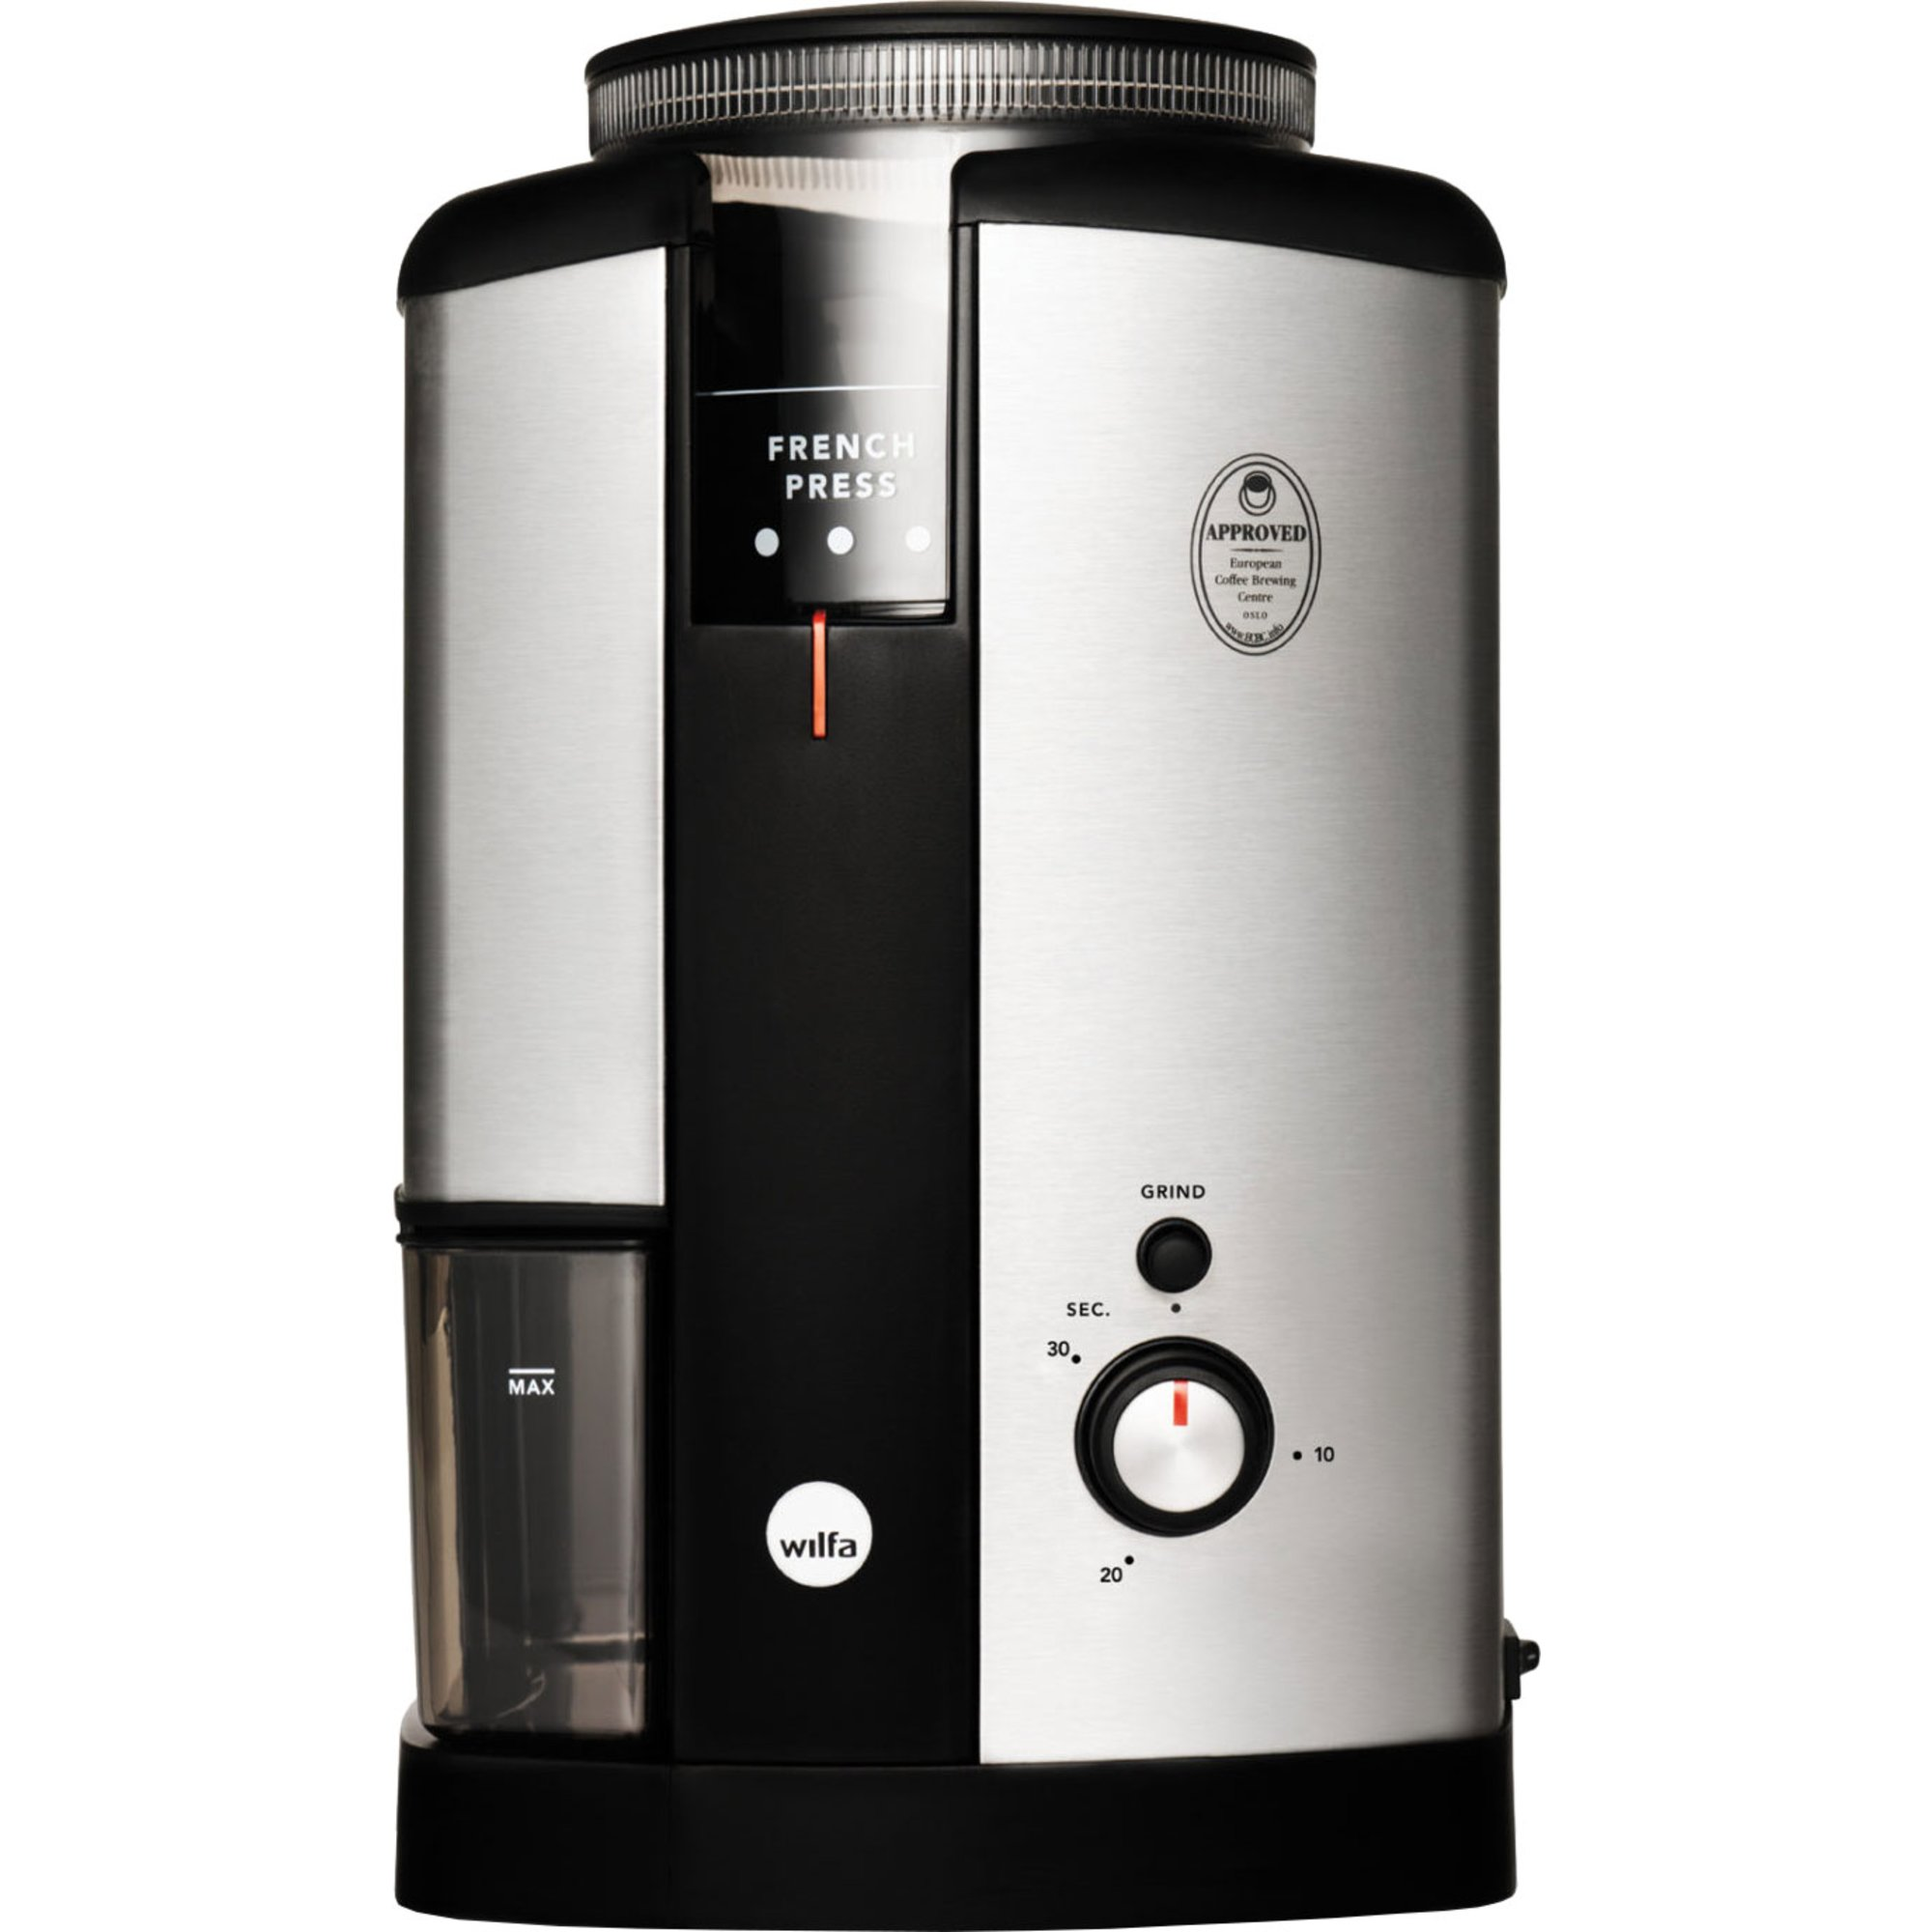 Wilfa WSCG2 – Kaffekvarn